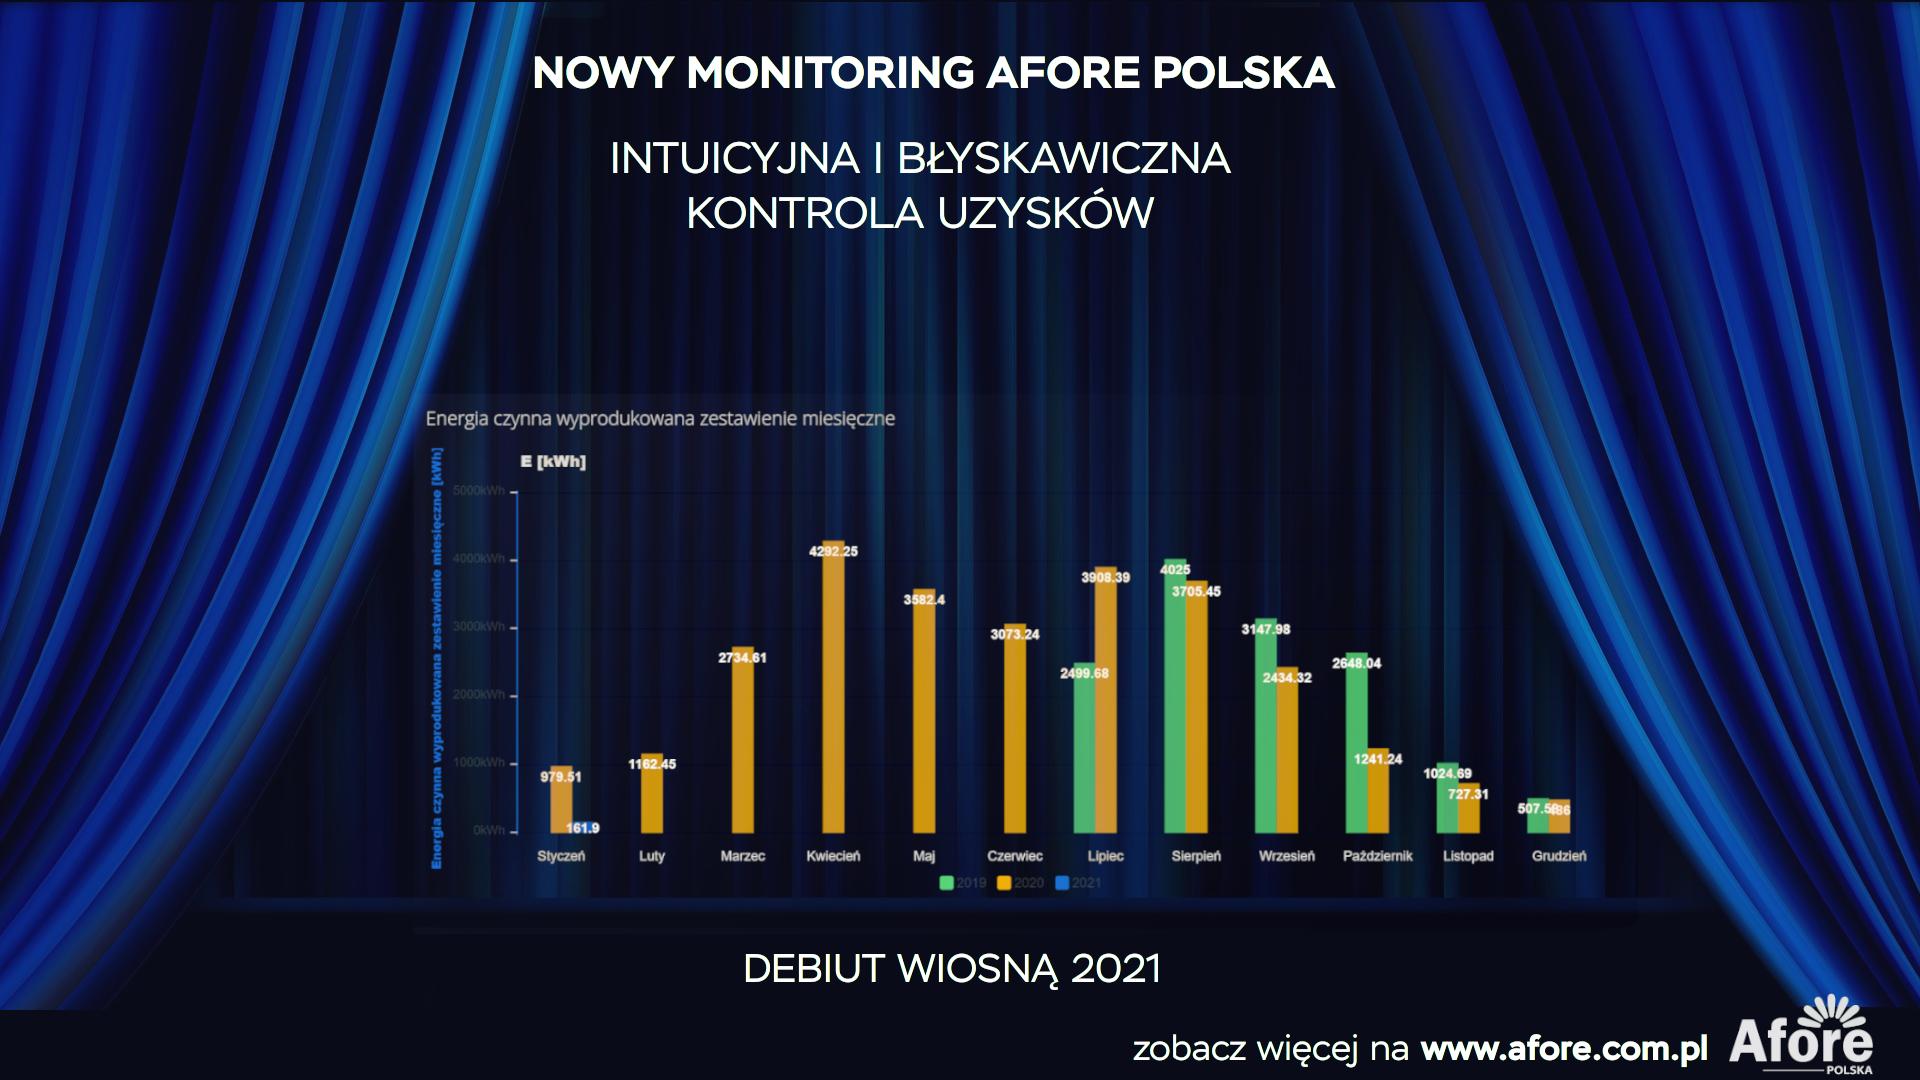 monitoring afore polska